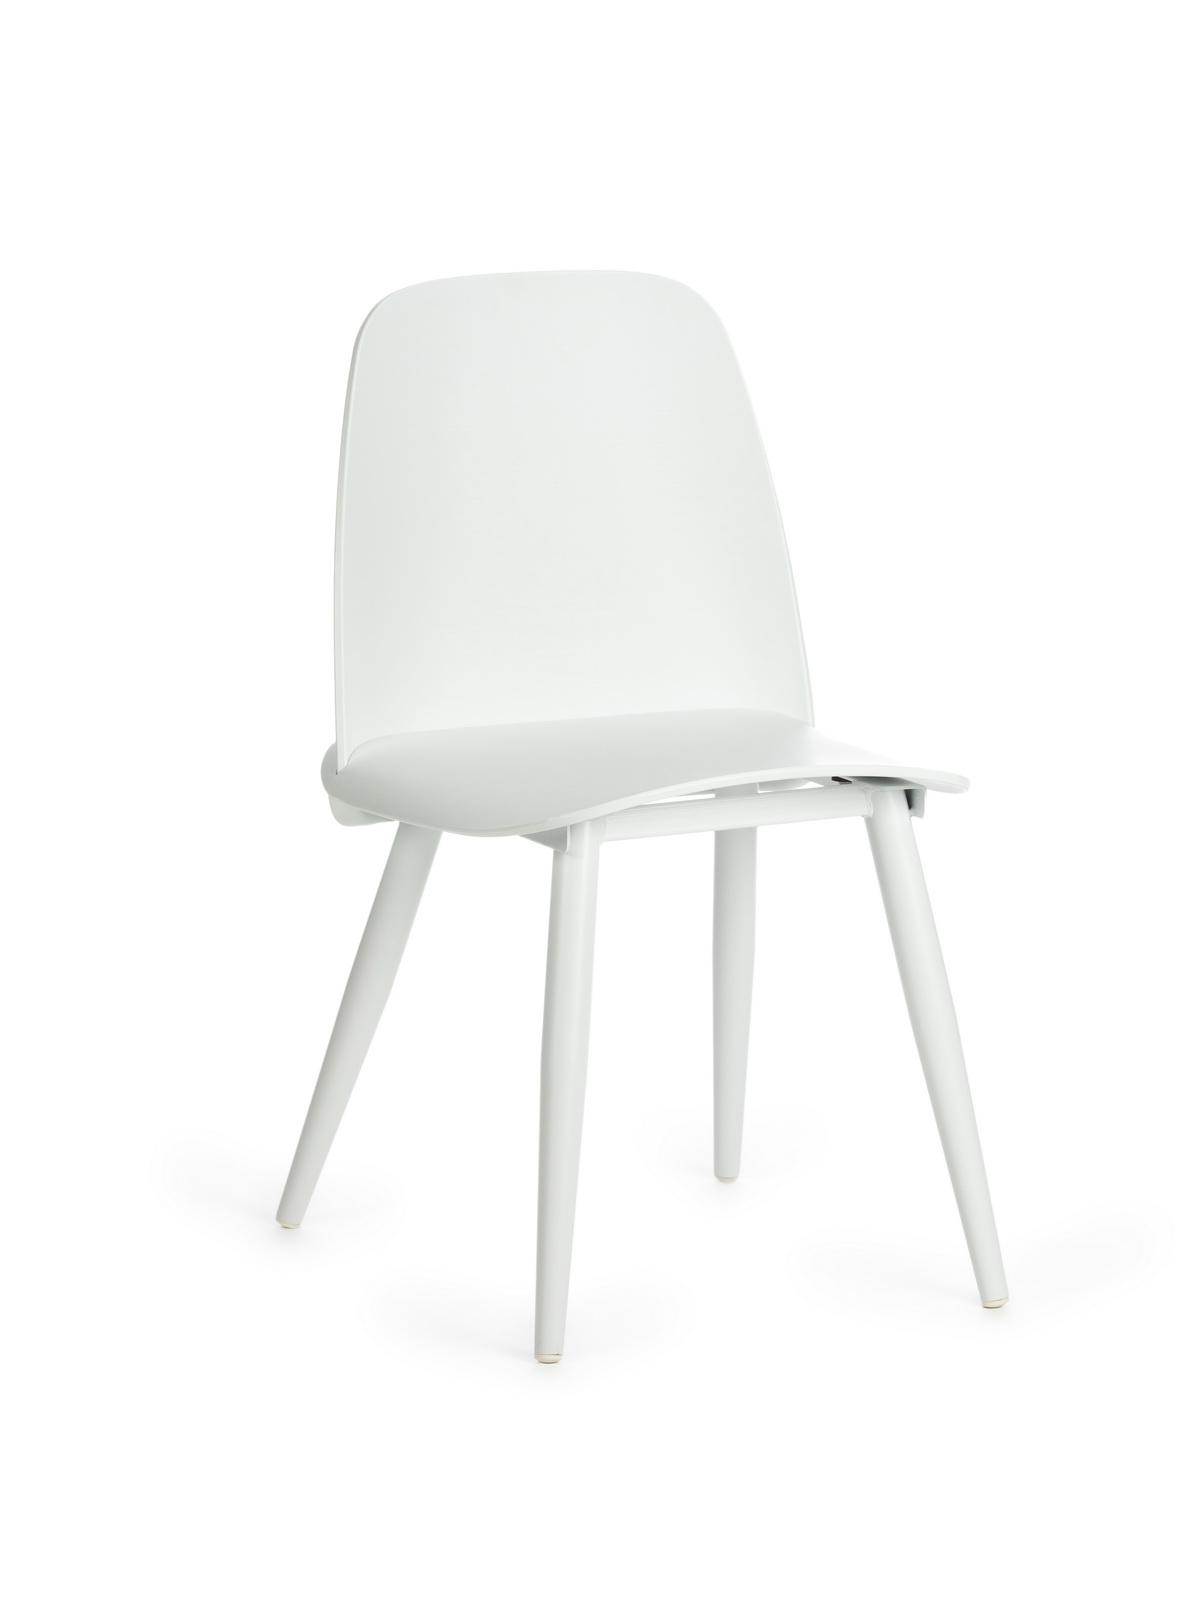 Scaun din plastic, cu picioare metalice Sting White, l50xA46xH80cm